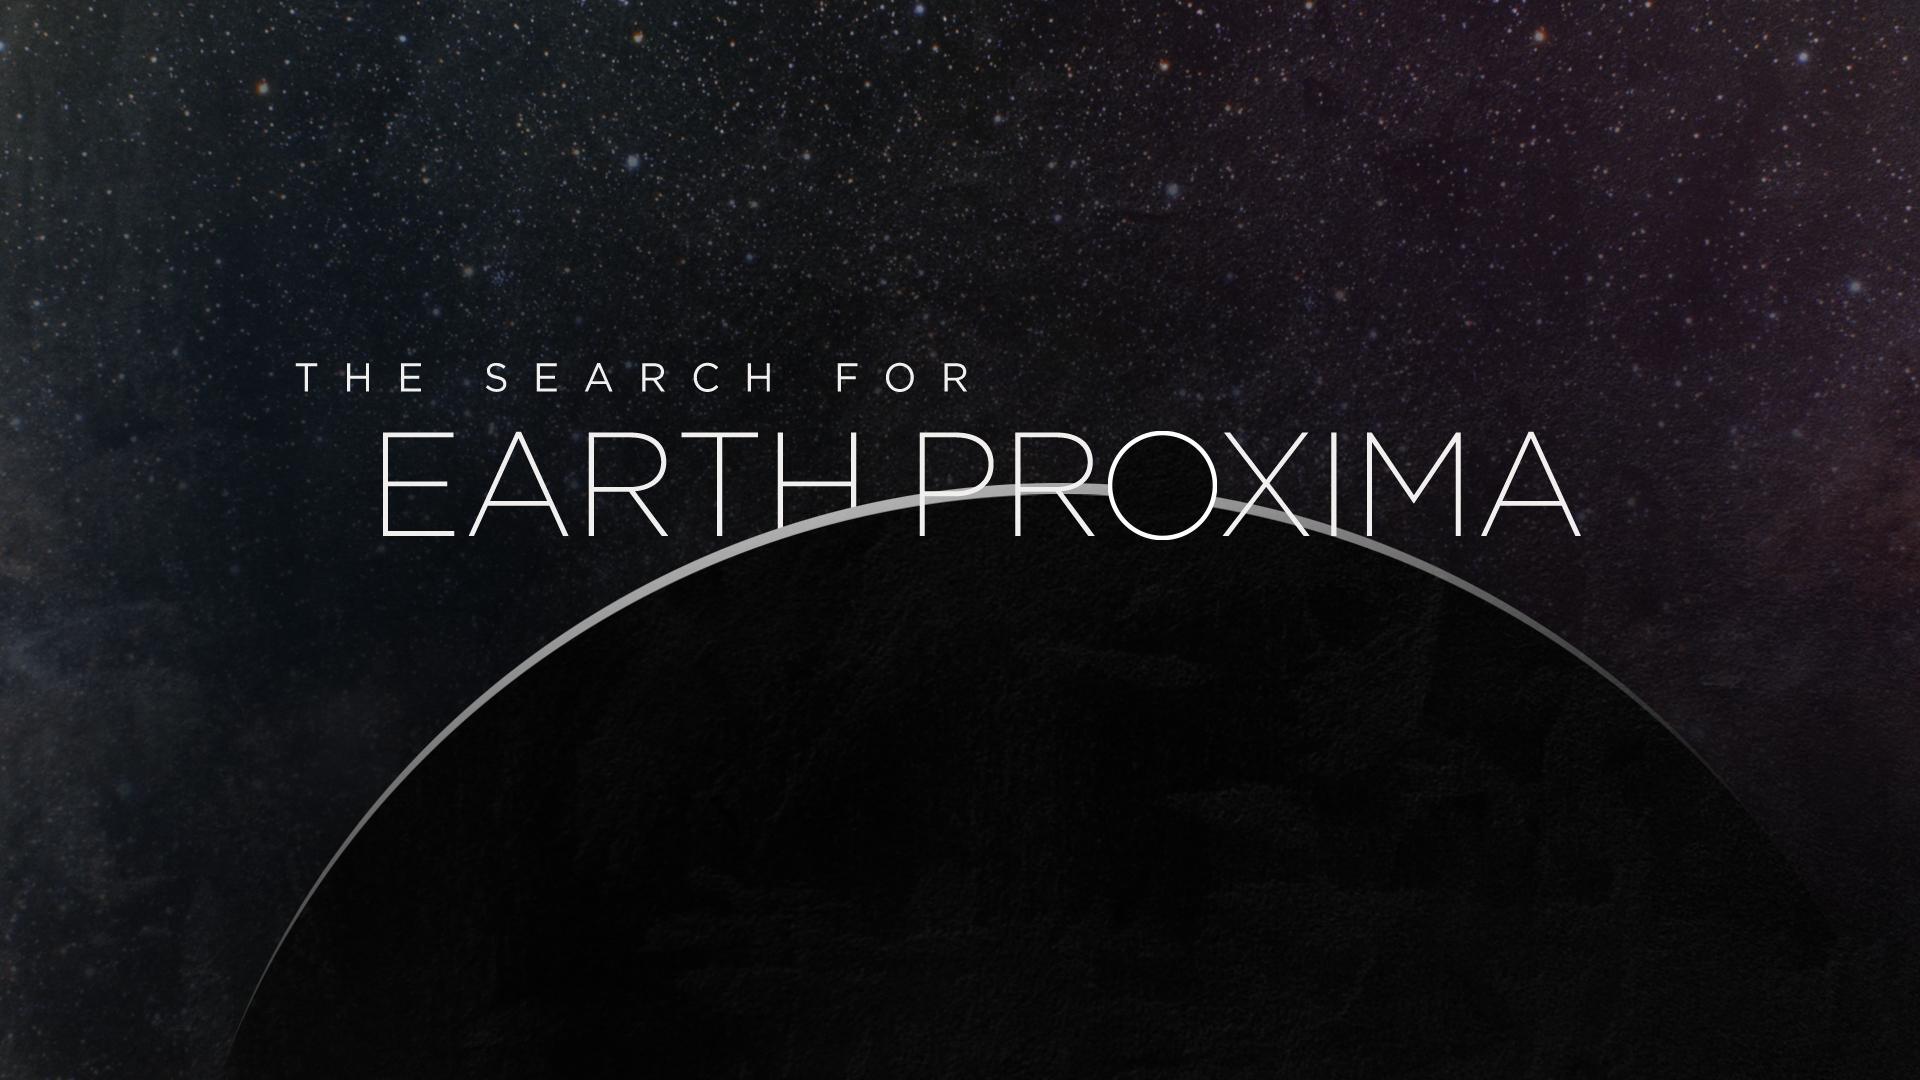 Earth-Proxima---Title-Card-(original).jpg